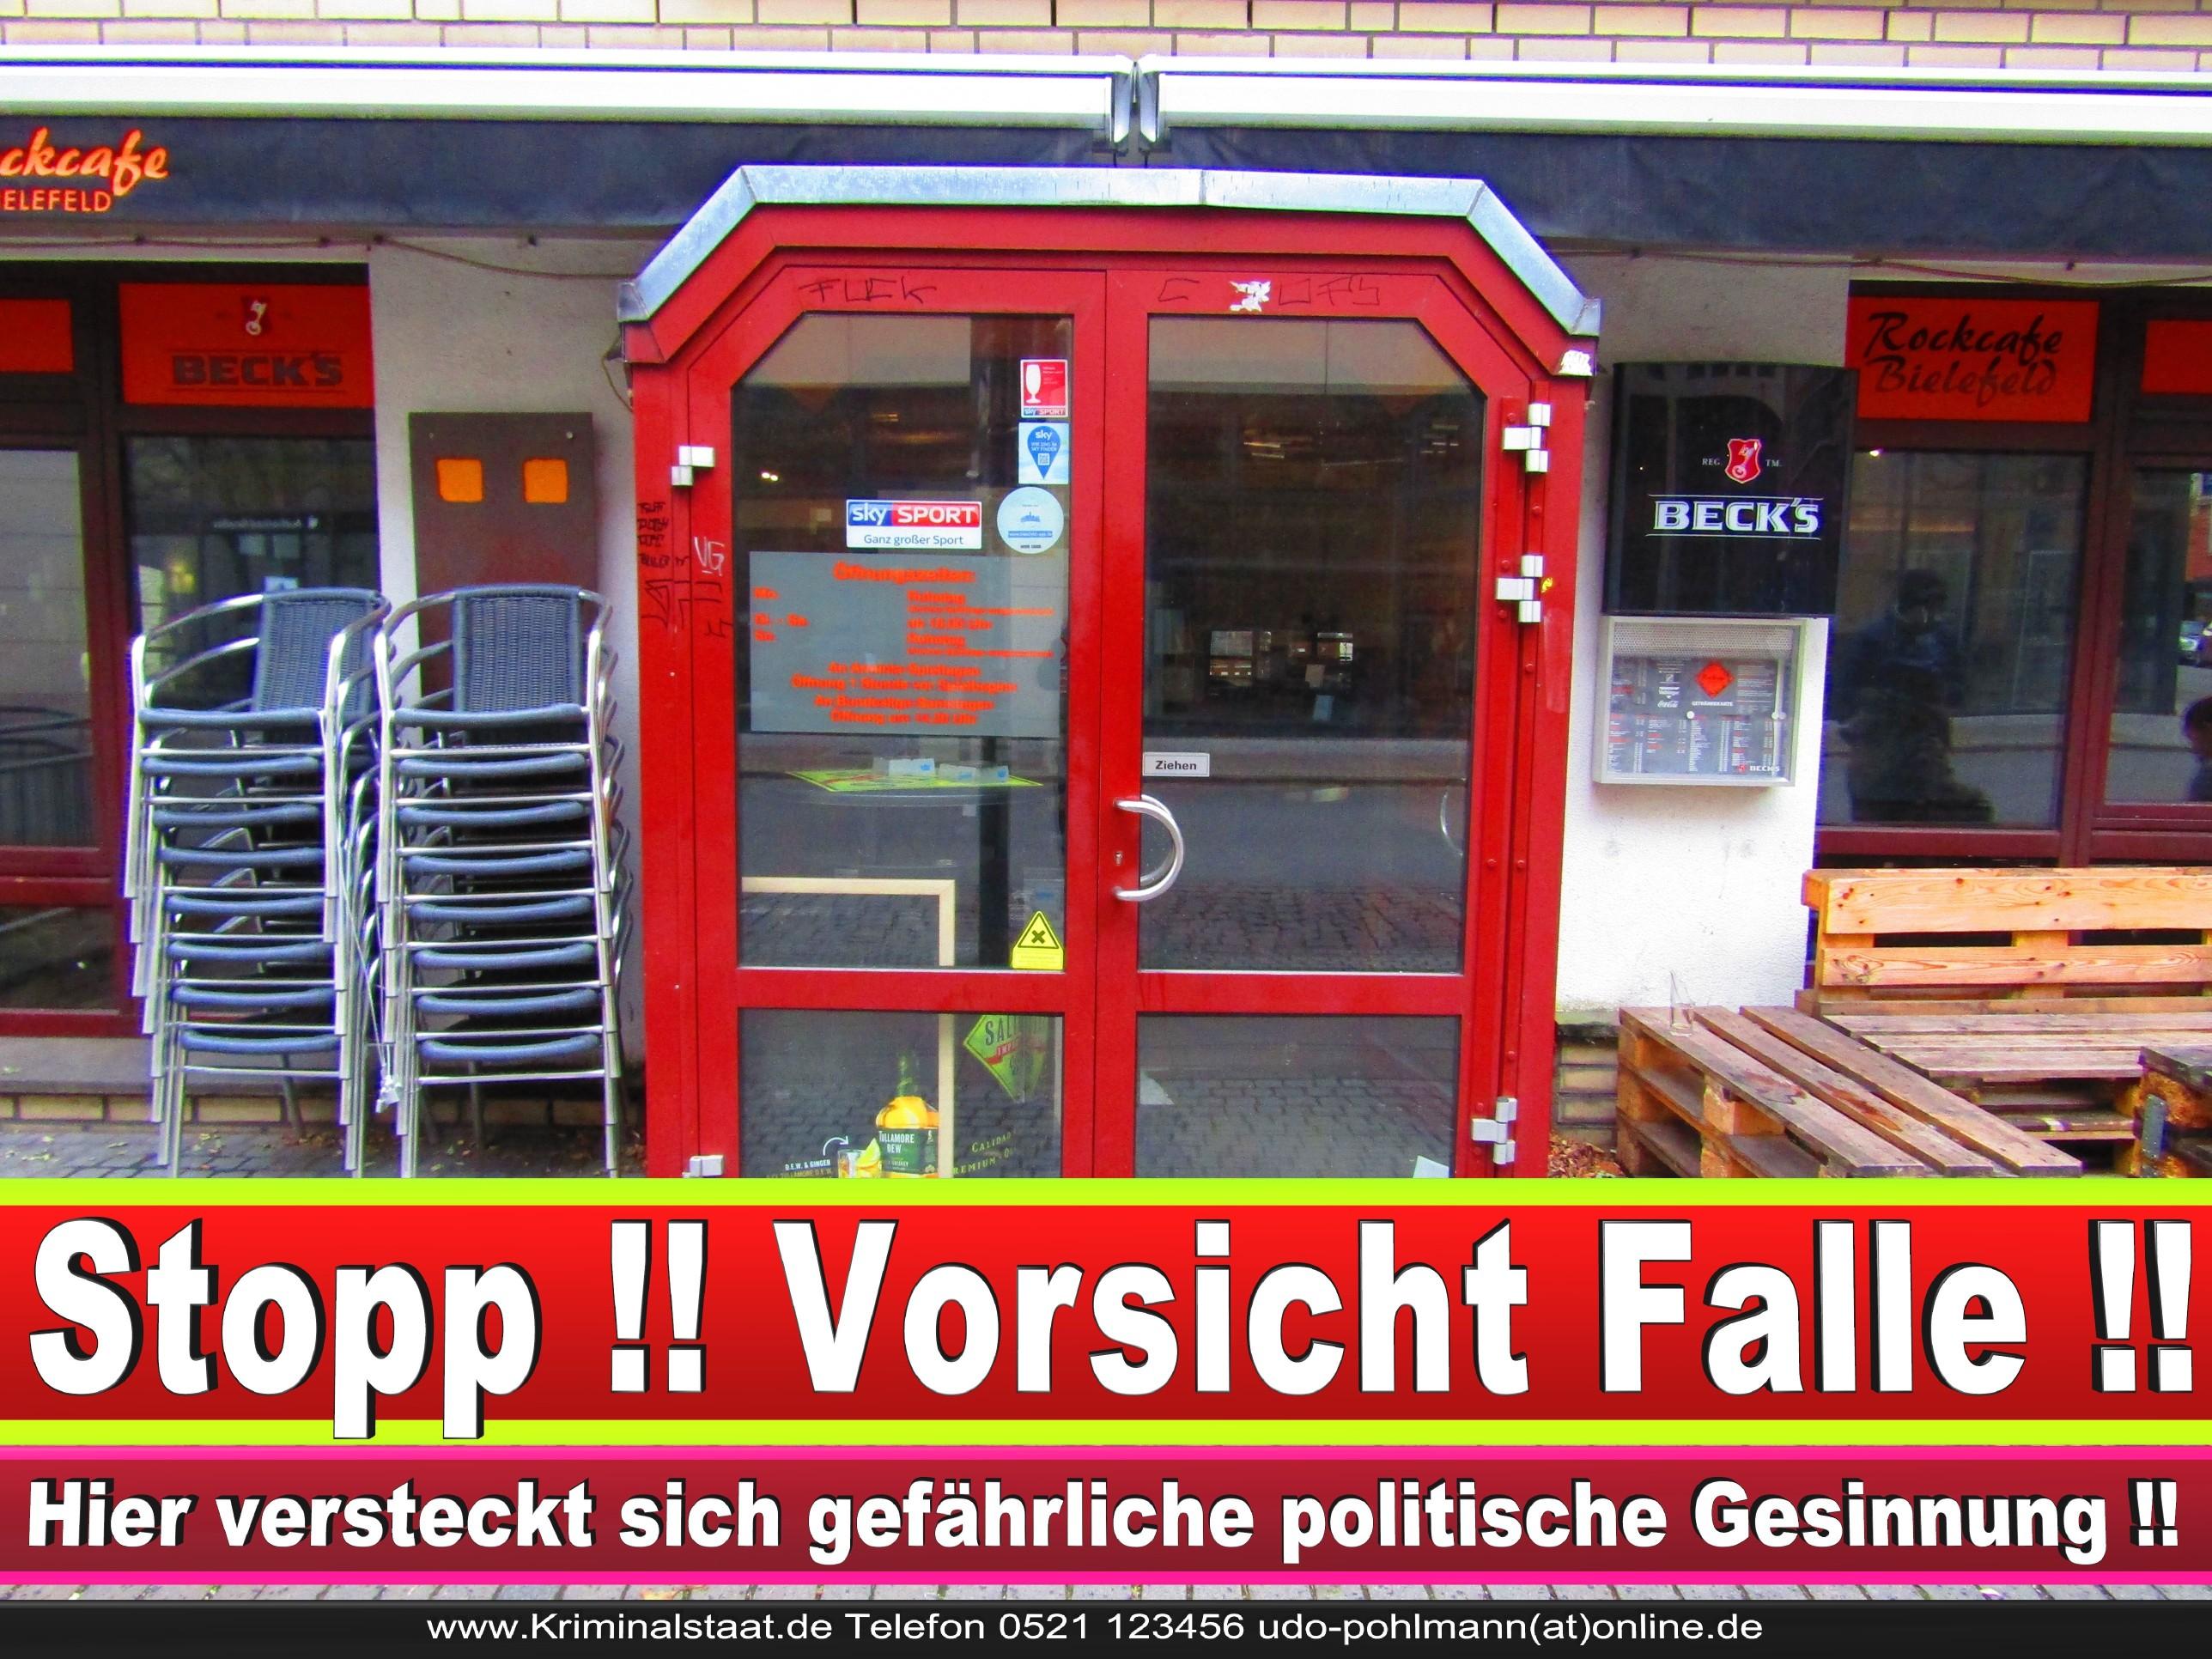 Rockcafe Bielefeld Neustädter Str 25 33602 CDU Bielefeld NRW 3